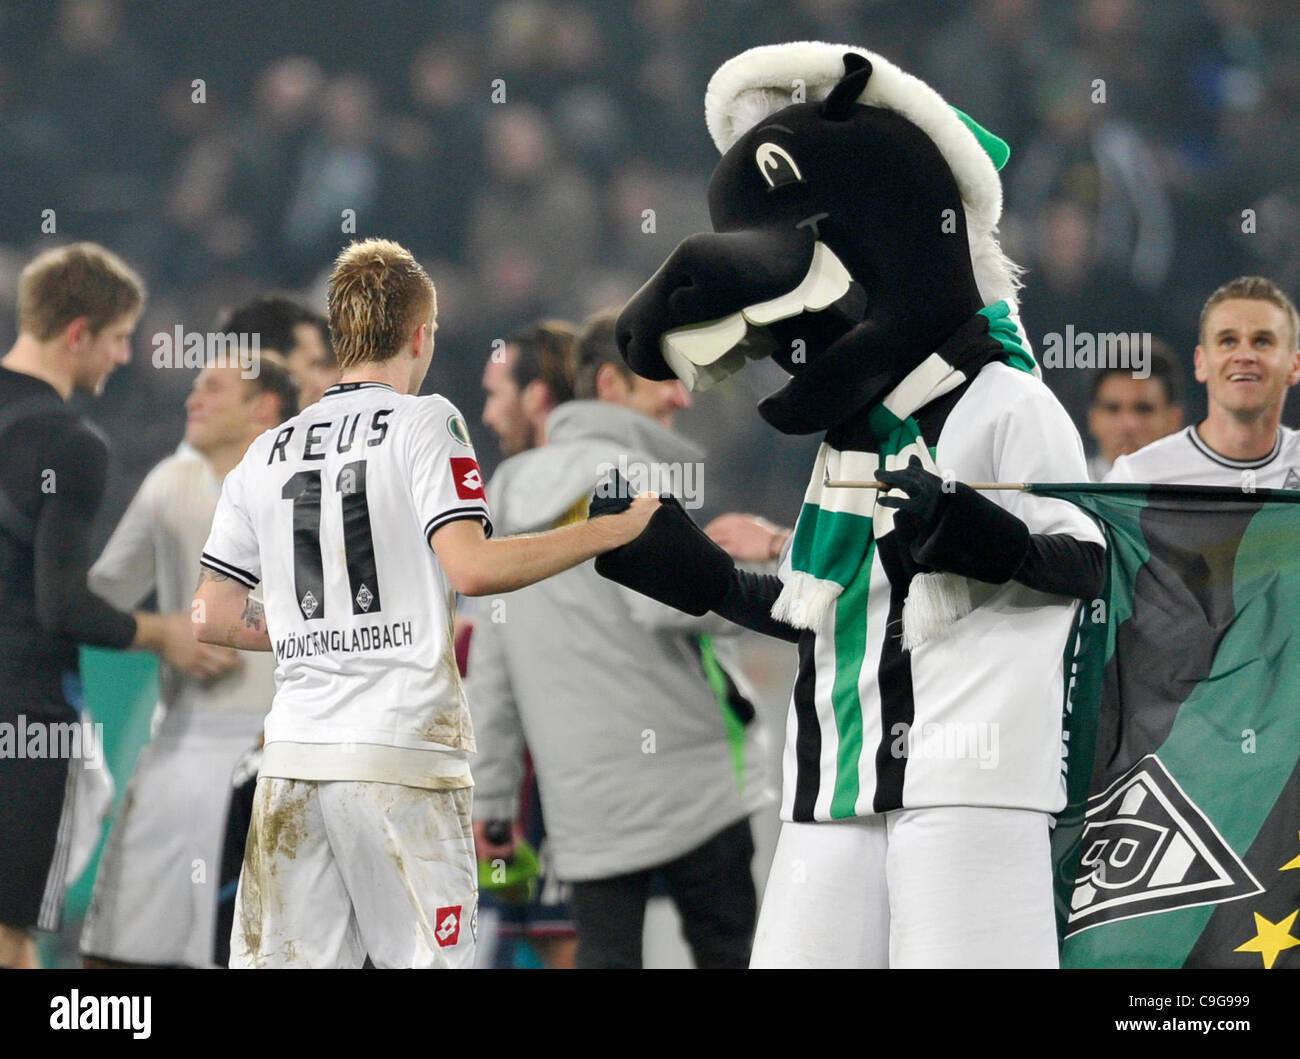 german national soccer cup, round of 16, Borussia Mönchengladbach (Moenchengladbach, Gladbach) vs Schalke 04 - Stock Image